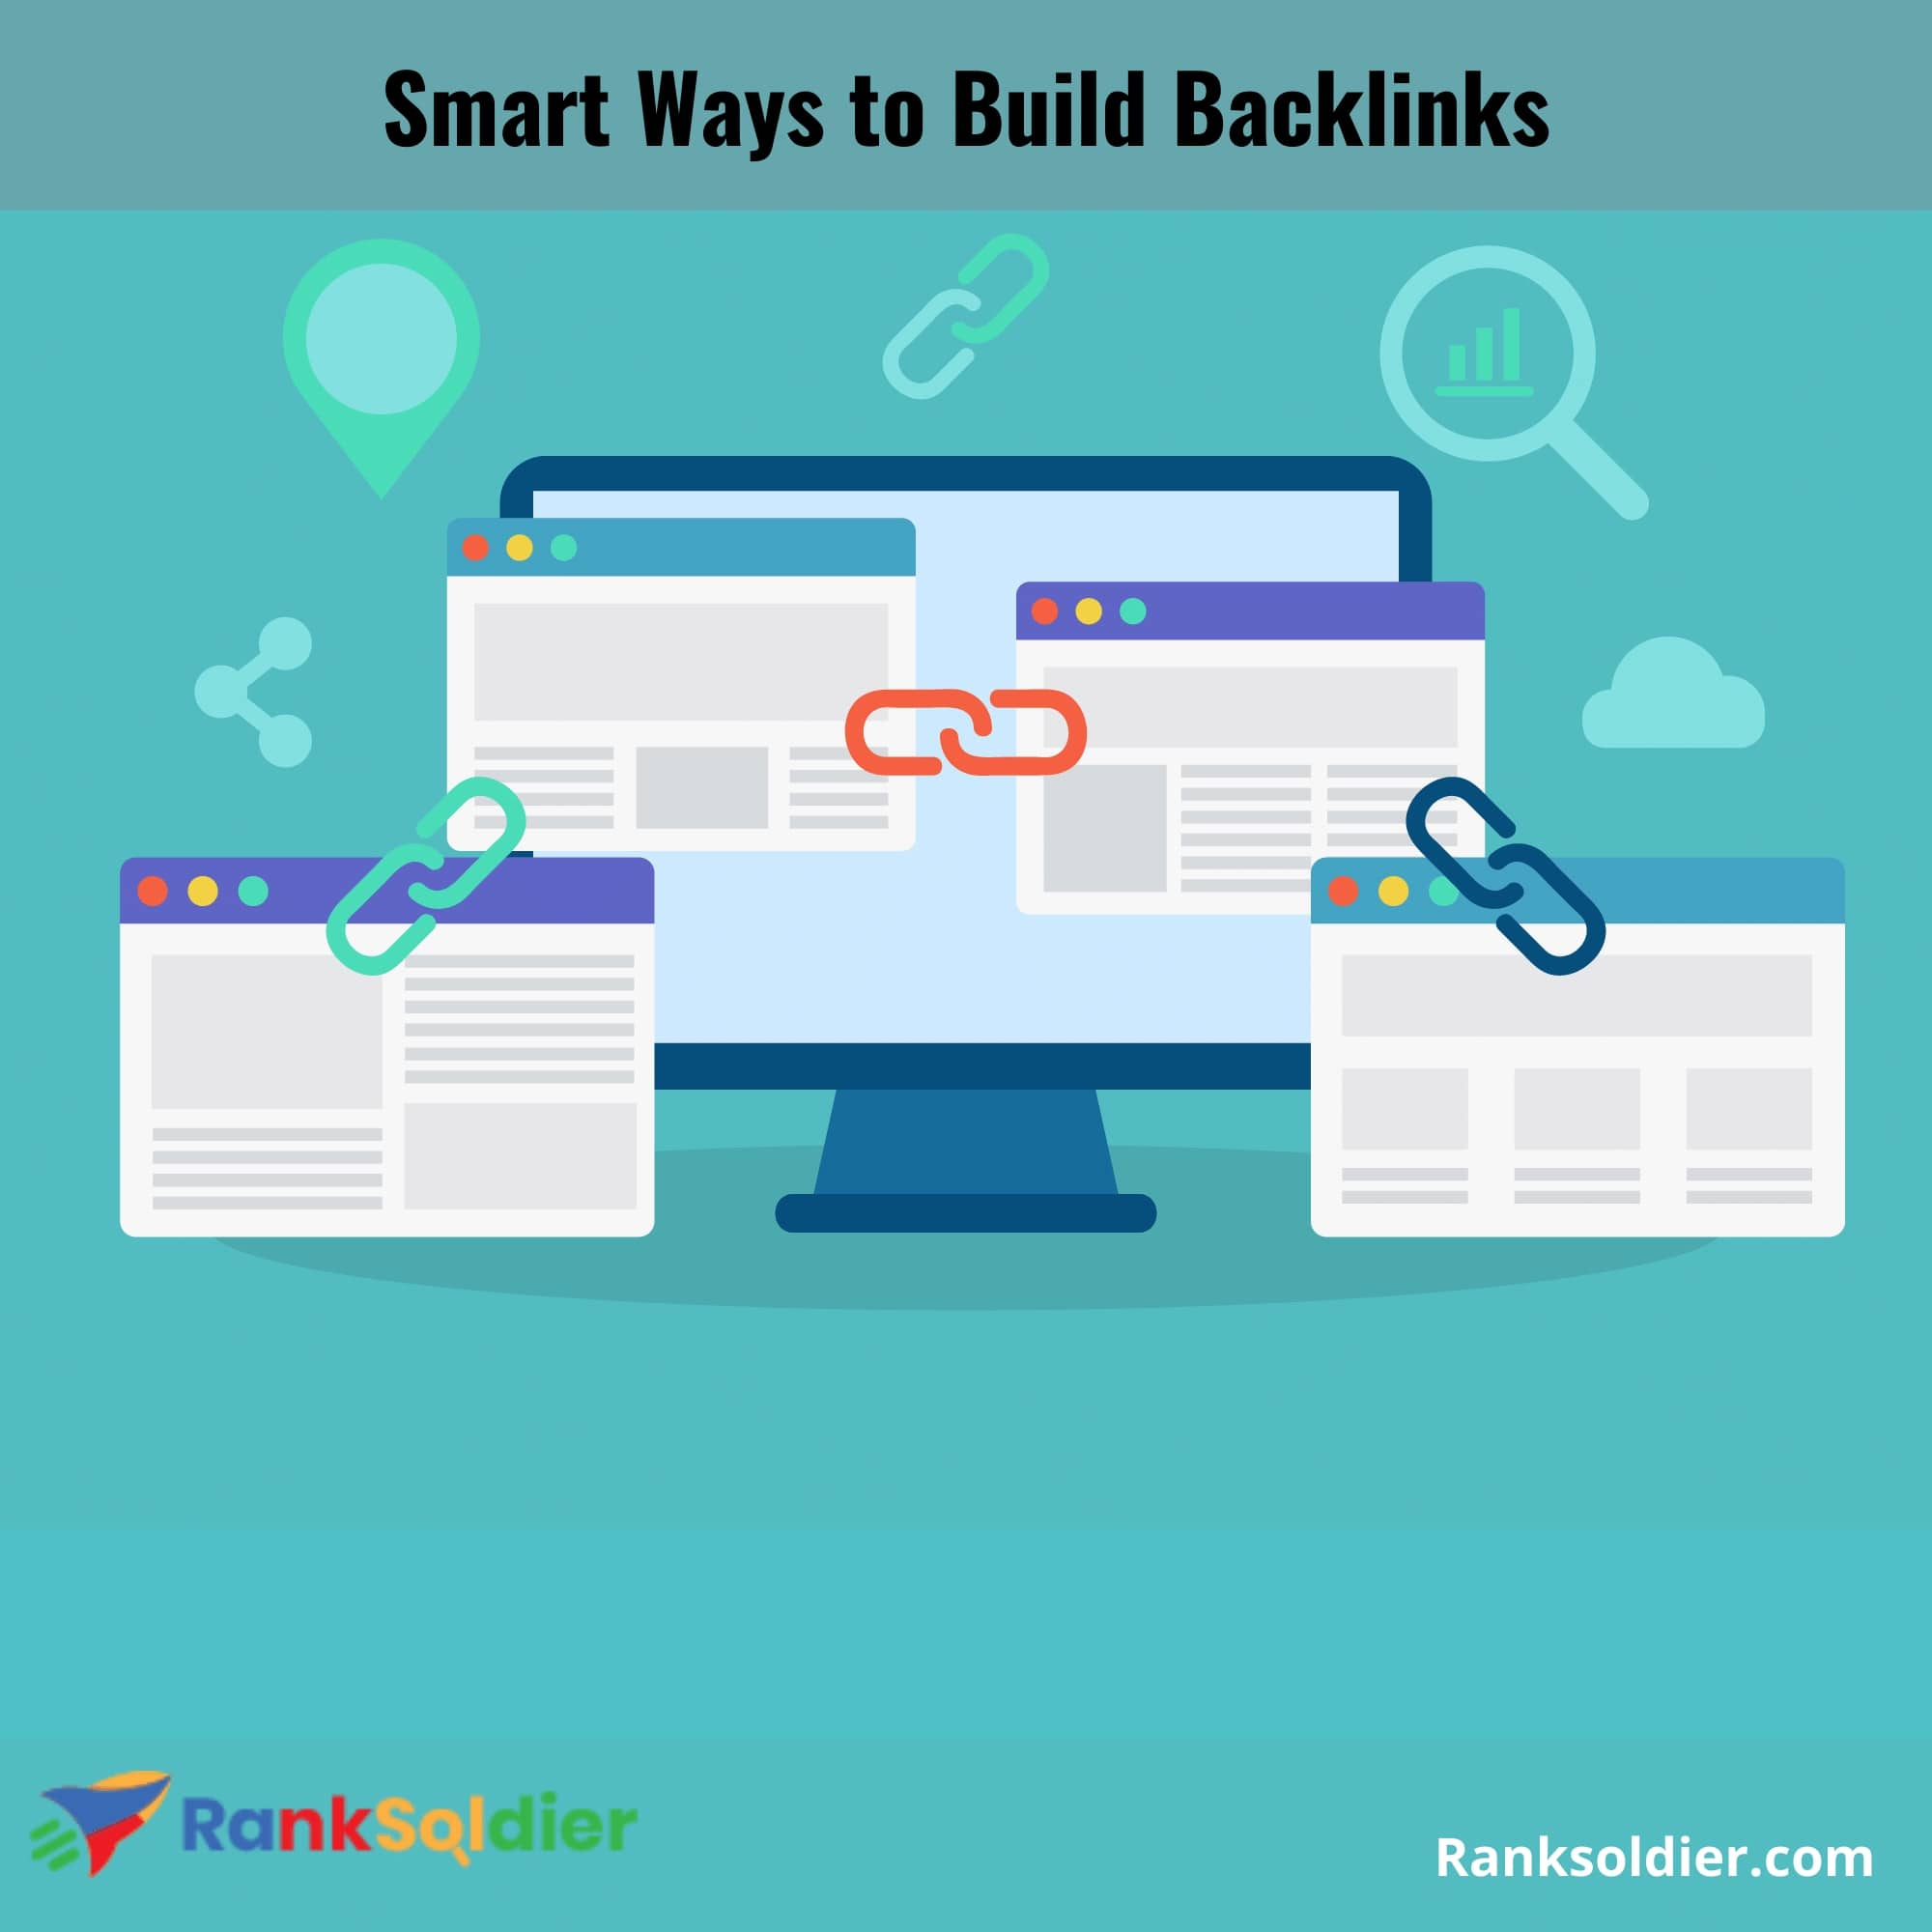 Smart Ways to Build Backlinks